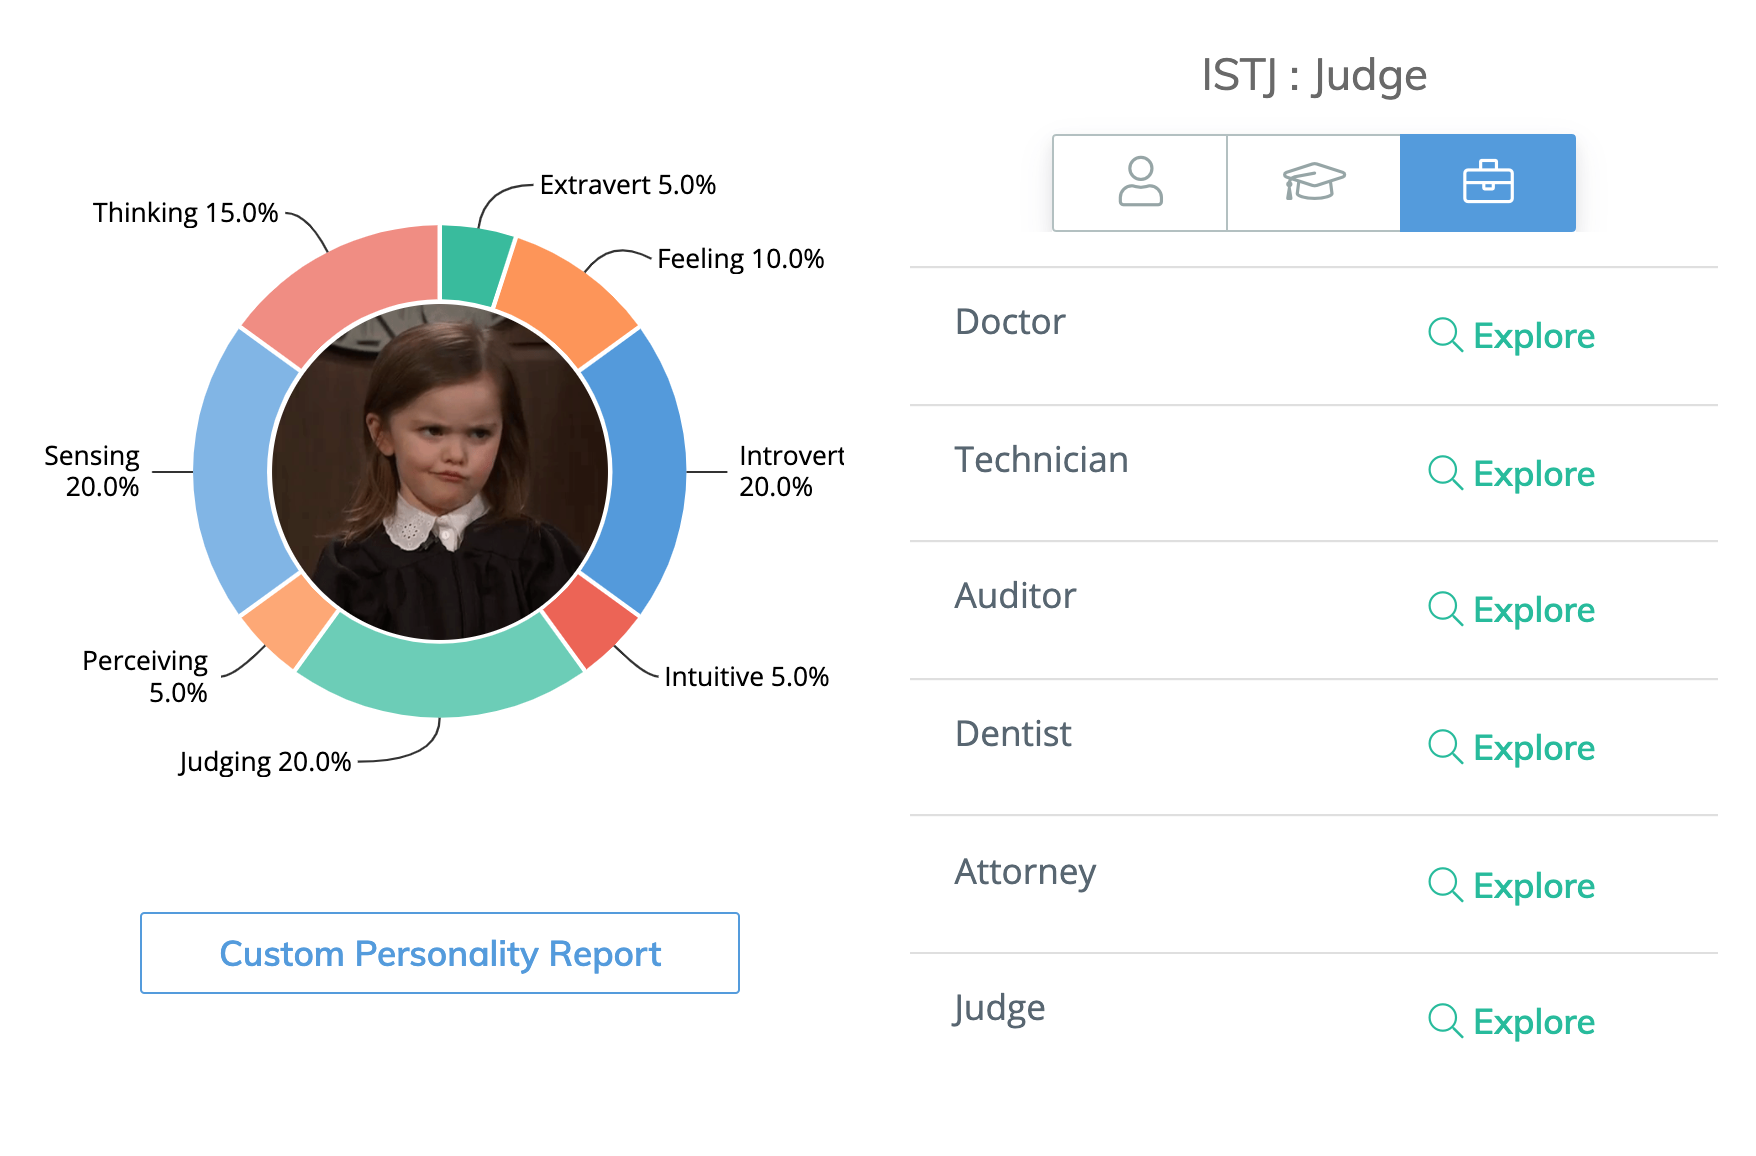 Steppingblocks Digital Career Counselor Personality Test